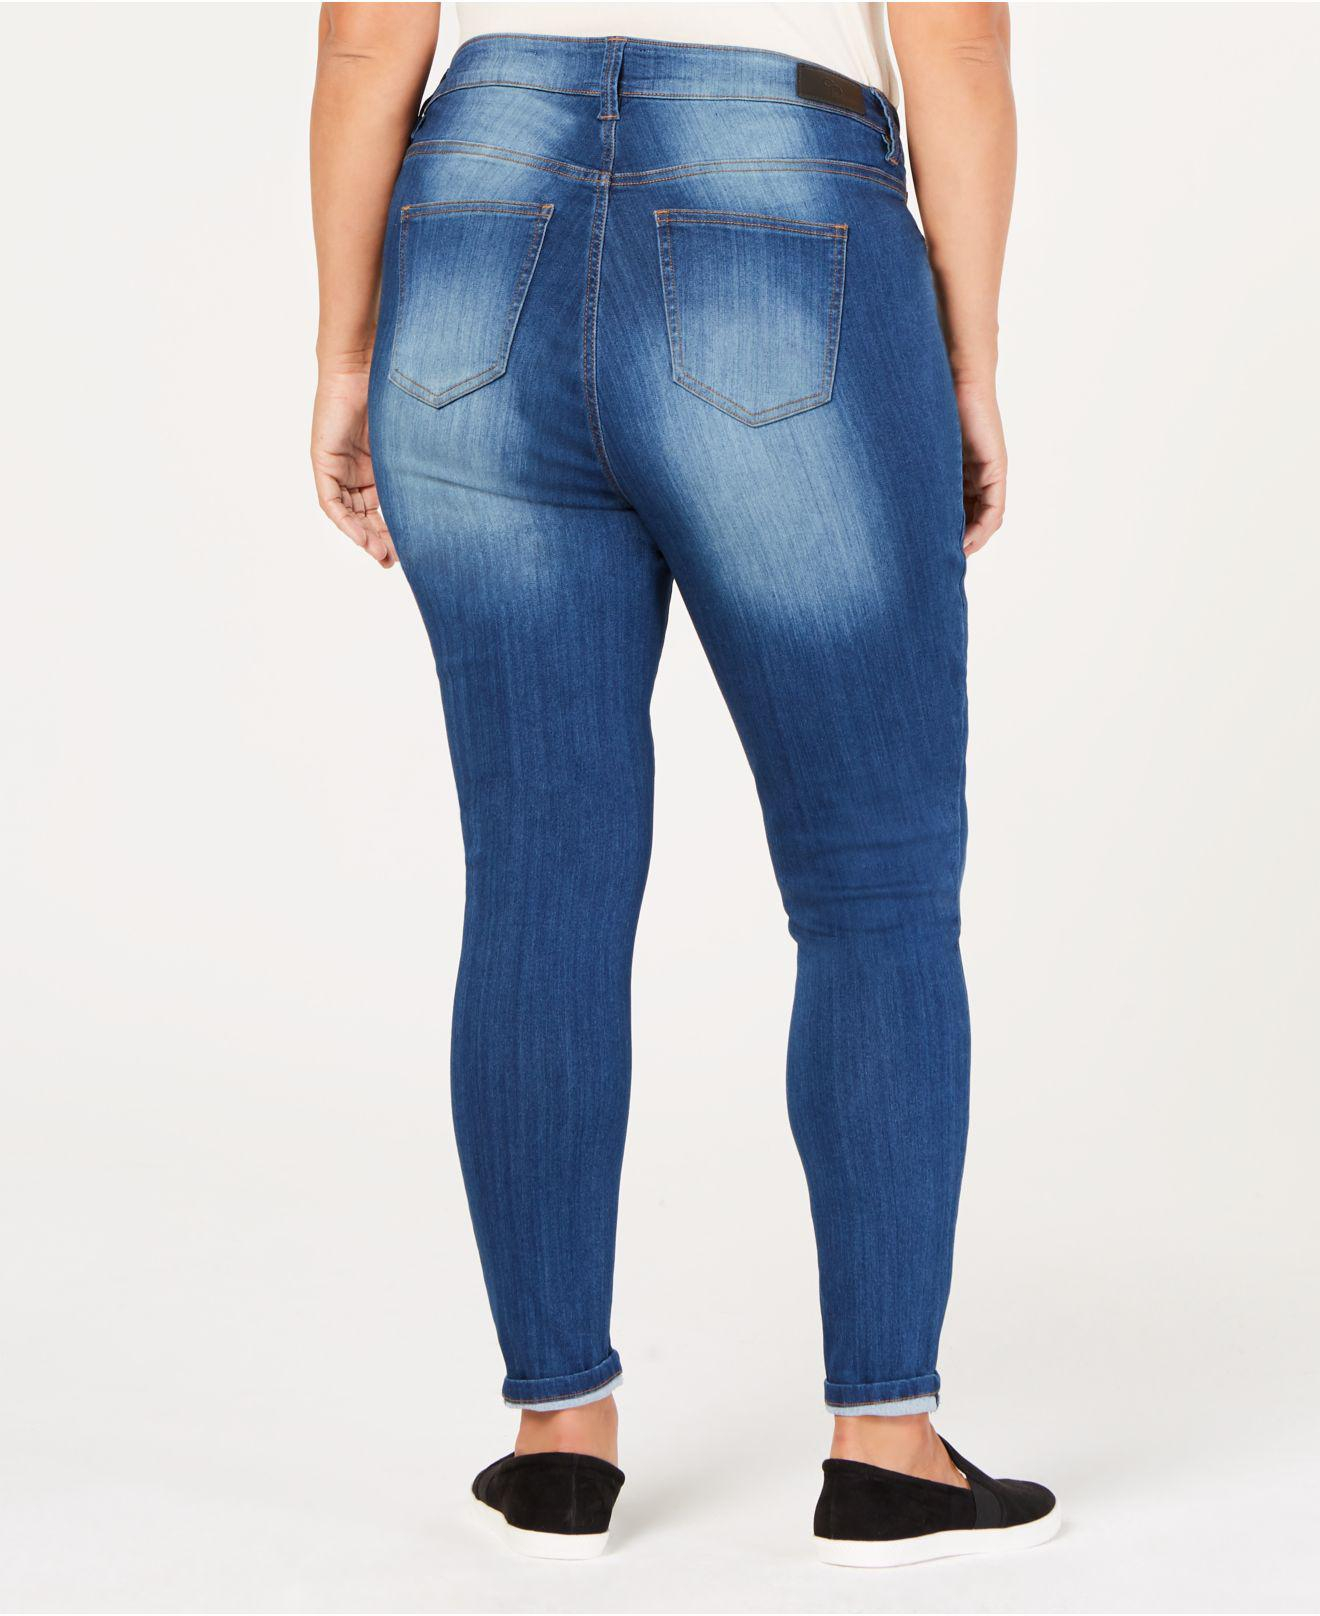 da85729040a64 Lyst - Celebrity Pink Plus Size Raw-hem Skinny Ankle Jeans in Blue